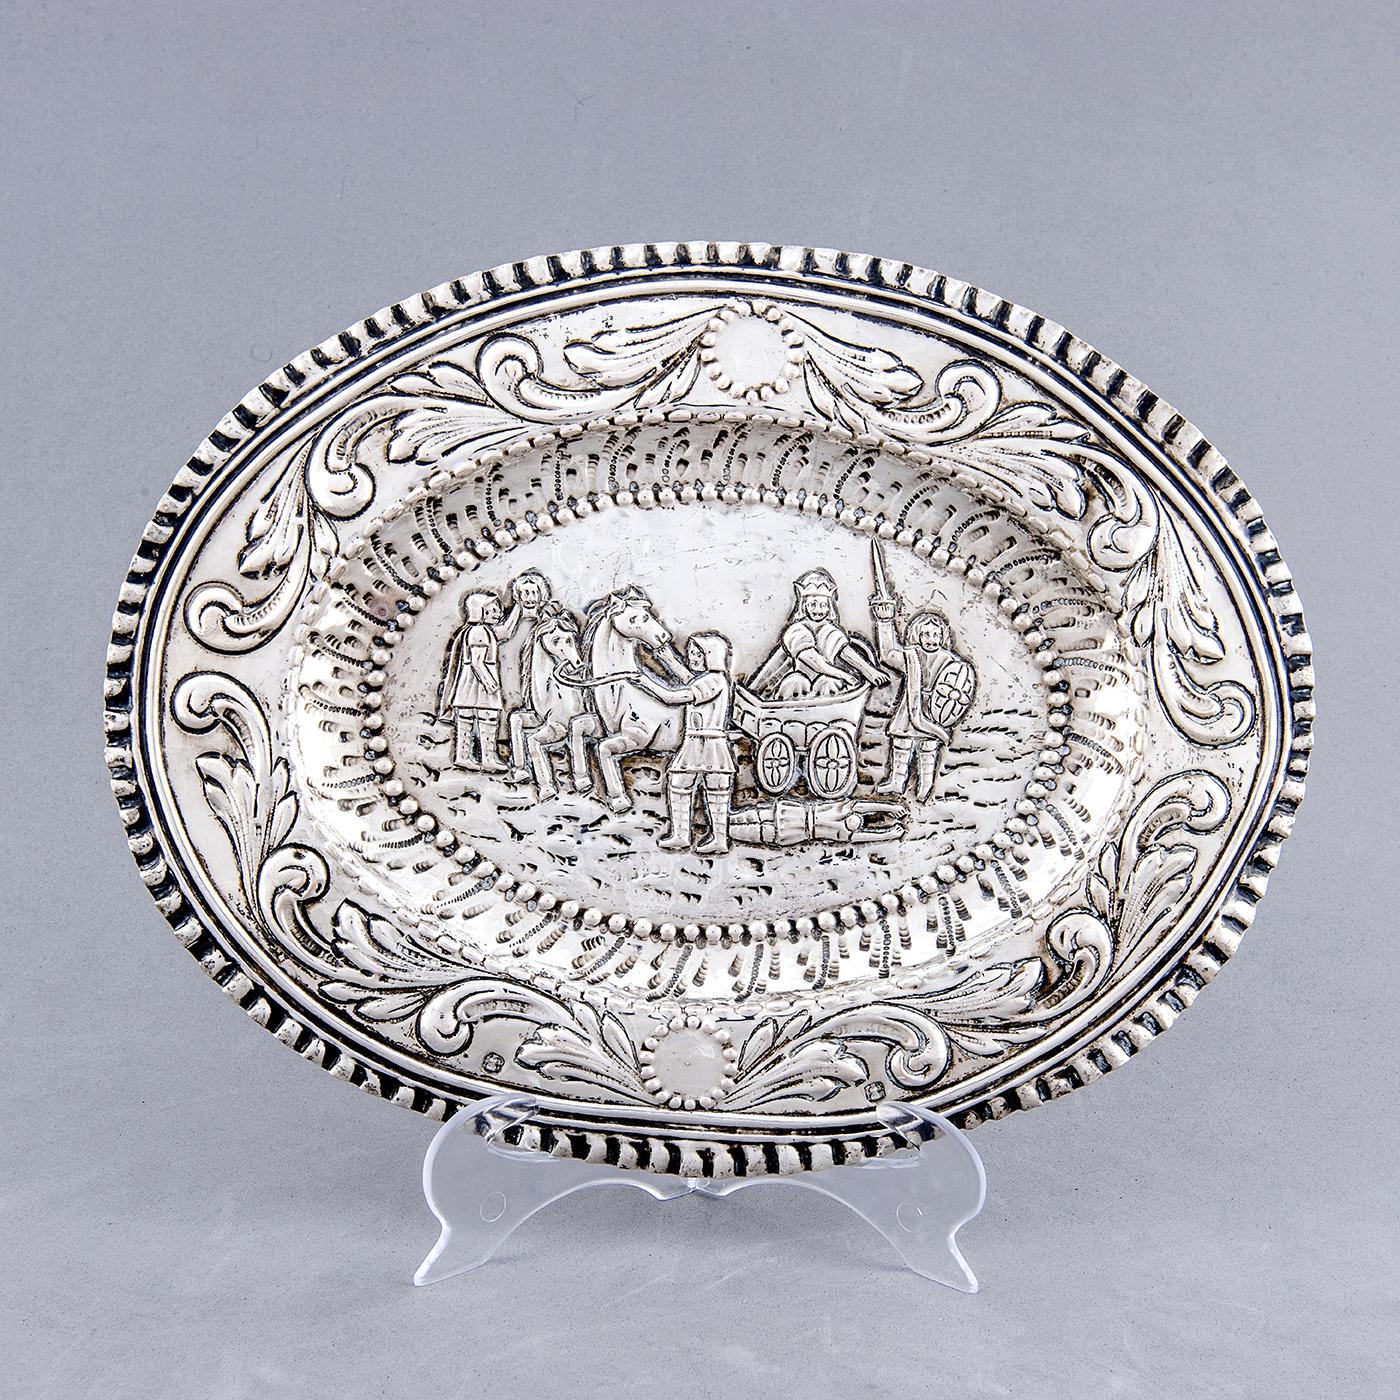 Bandeja decorativa oval en Plata. Castilla La Mancha, siglo XVIII.